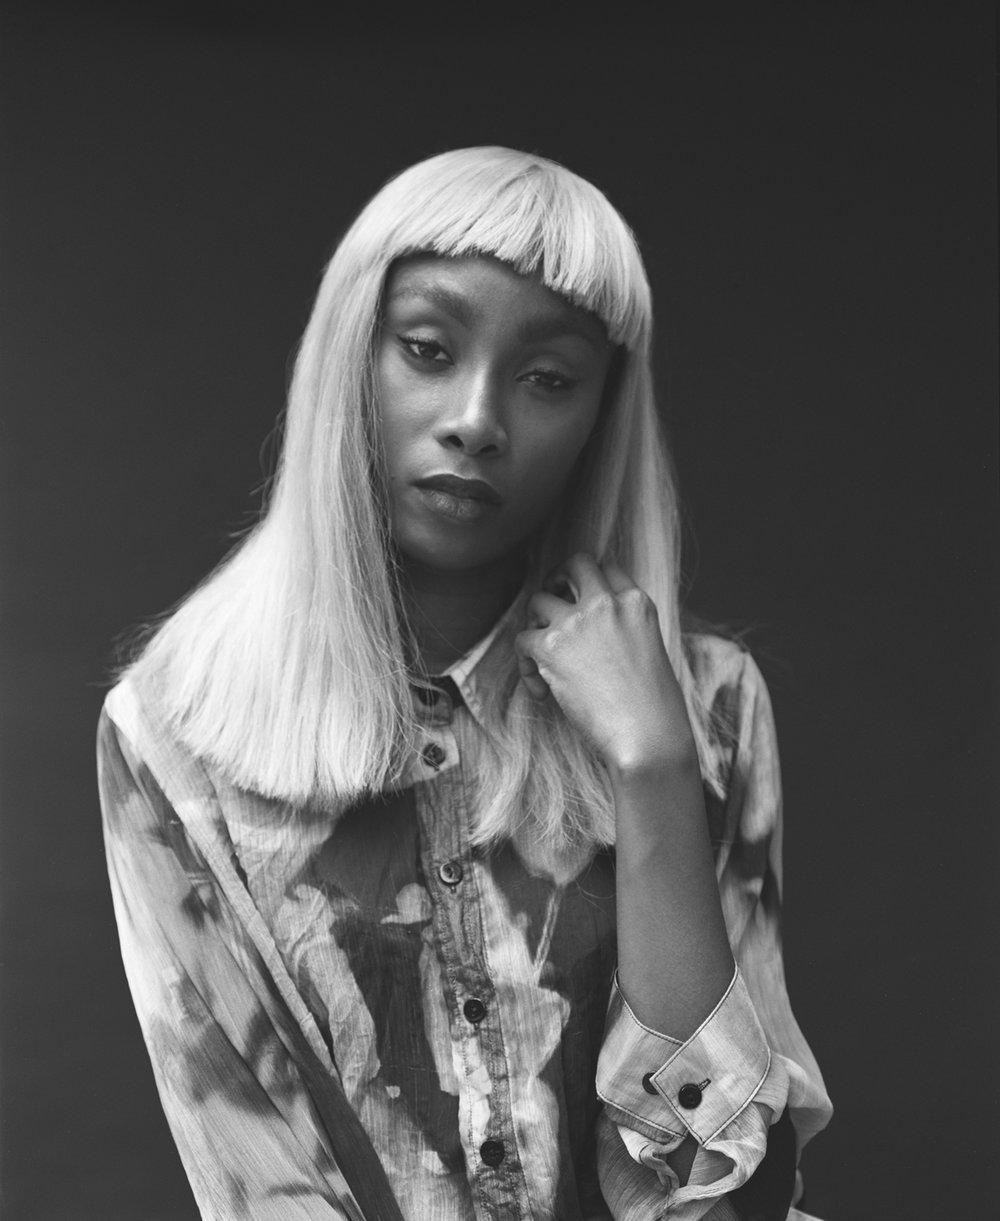 Singer Bridgette Amofah